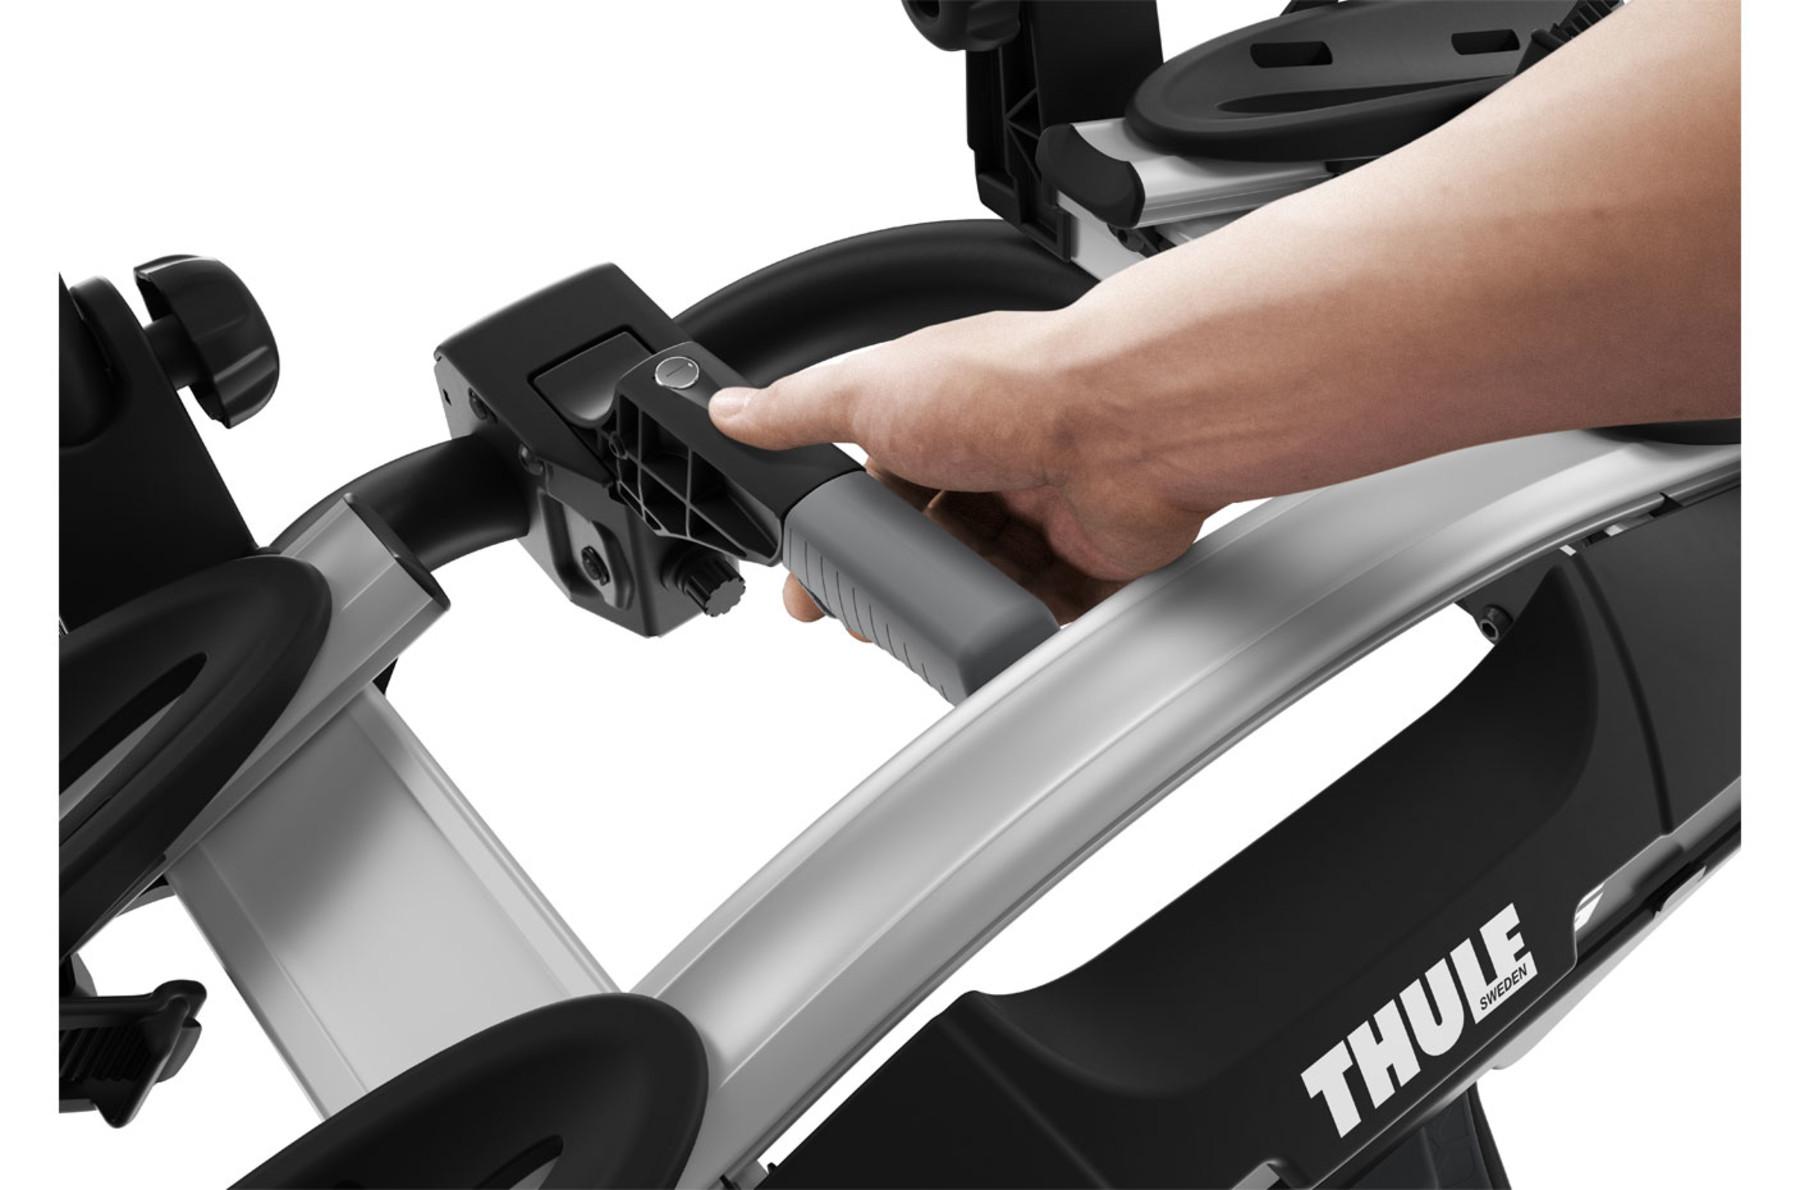 Transbike P/ 2 Bicicletas Engate Thule VeloCompact (925)